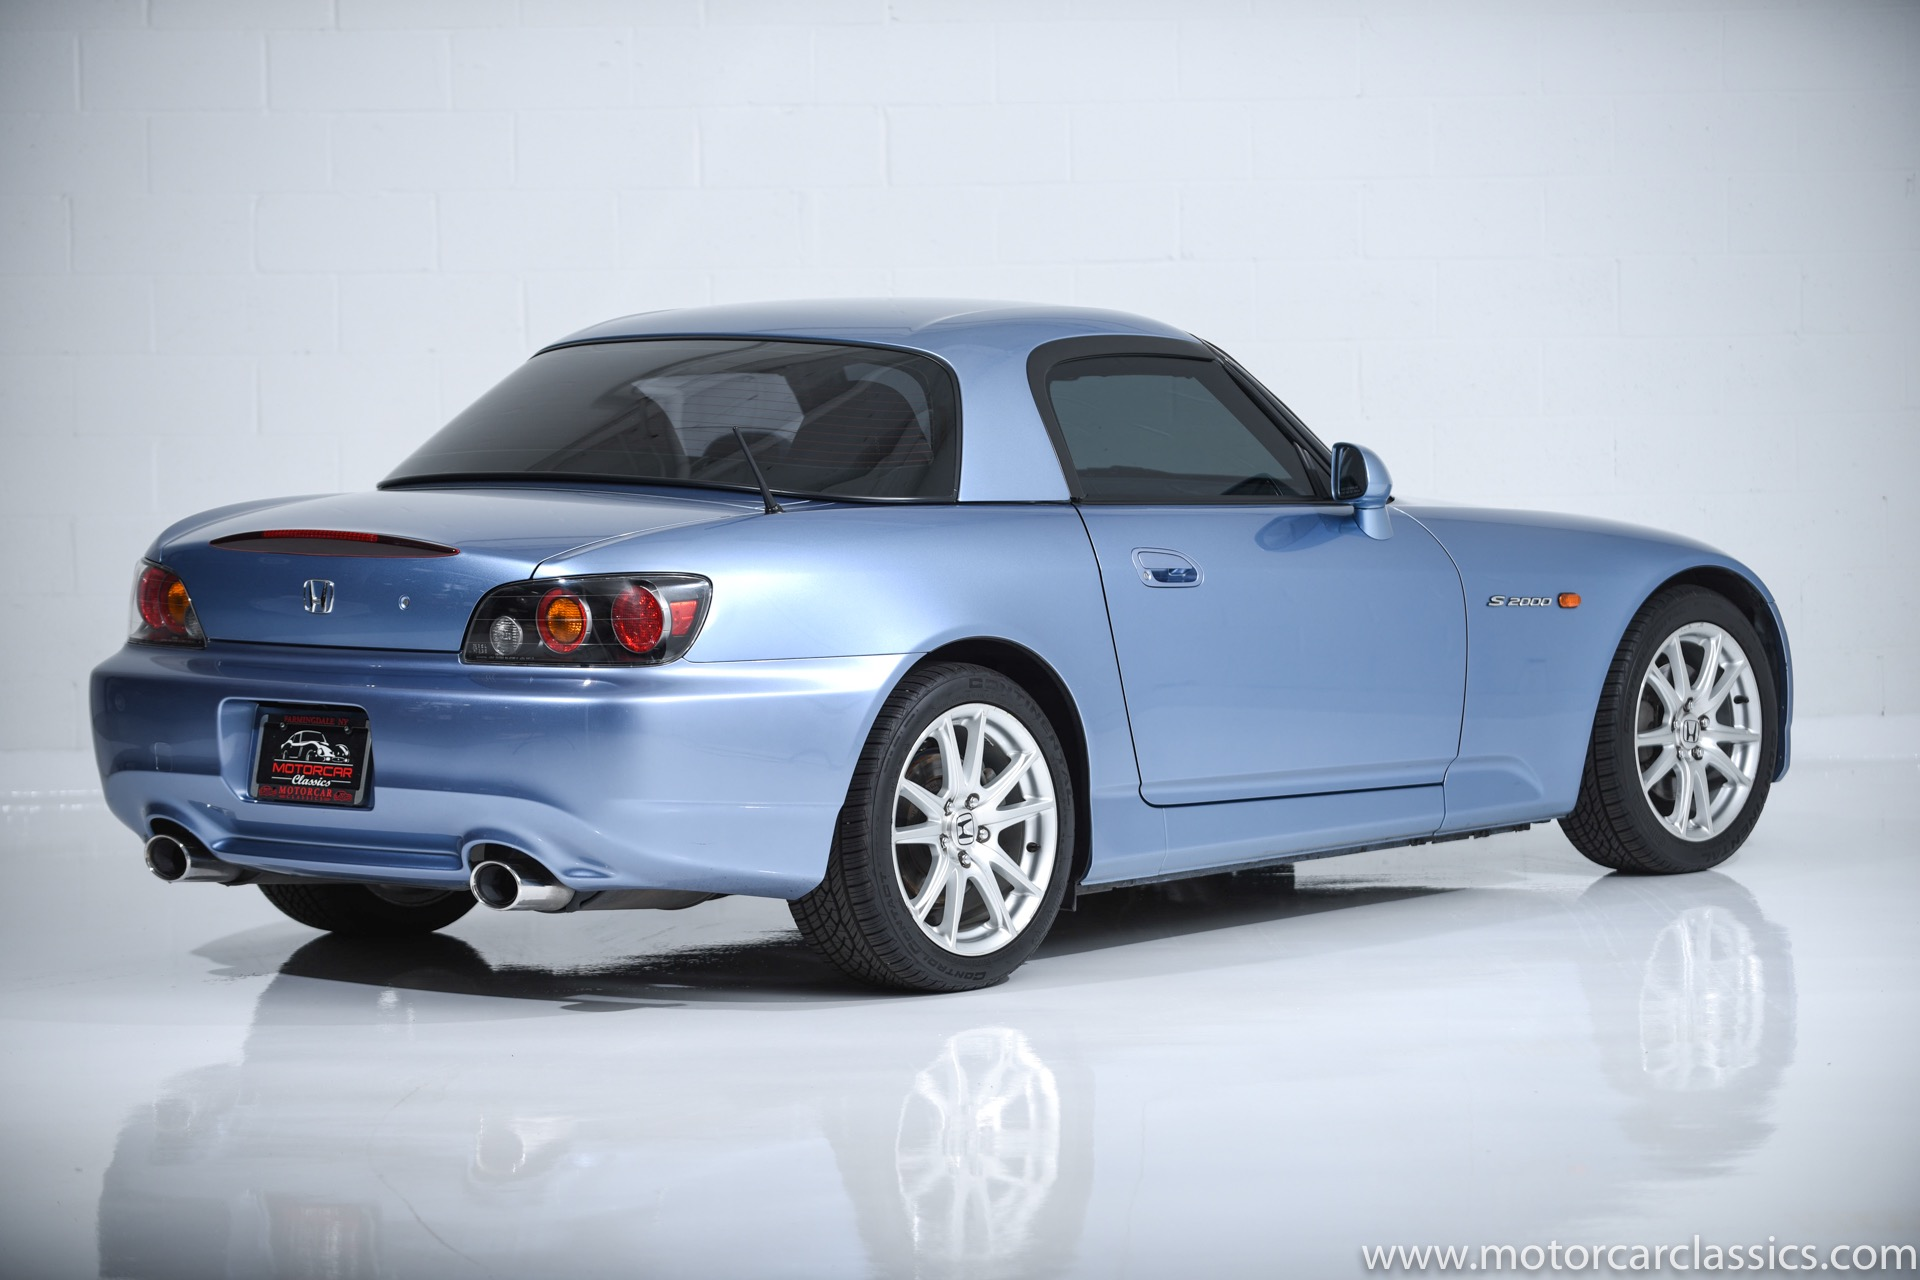 Used 2004 Honda S2000 For Sale 32 500 Motorcar